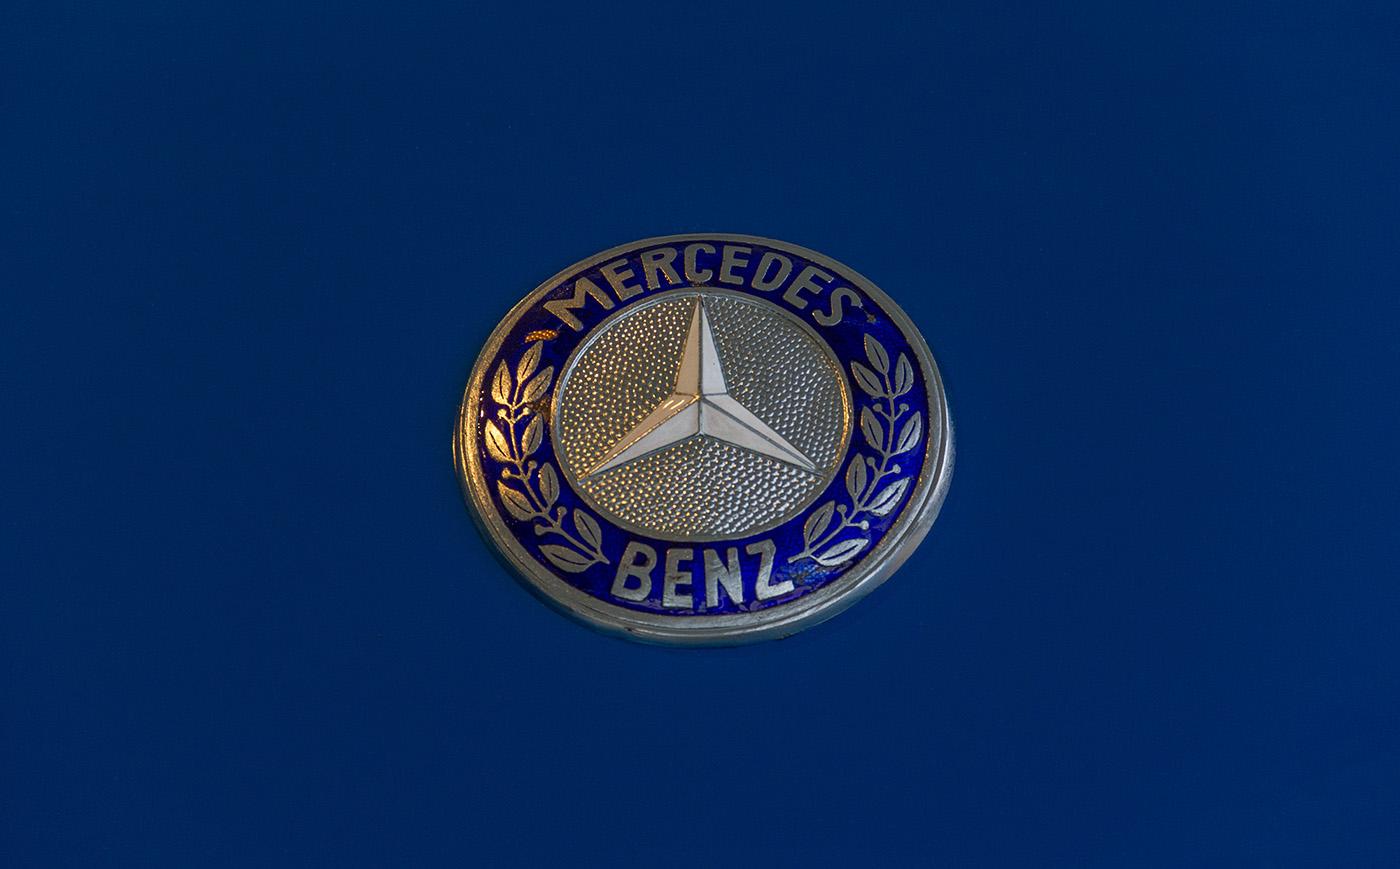 Mercedes benz logo old wagrati tags biocorpaavc